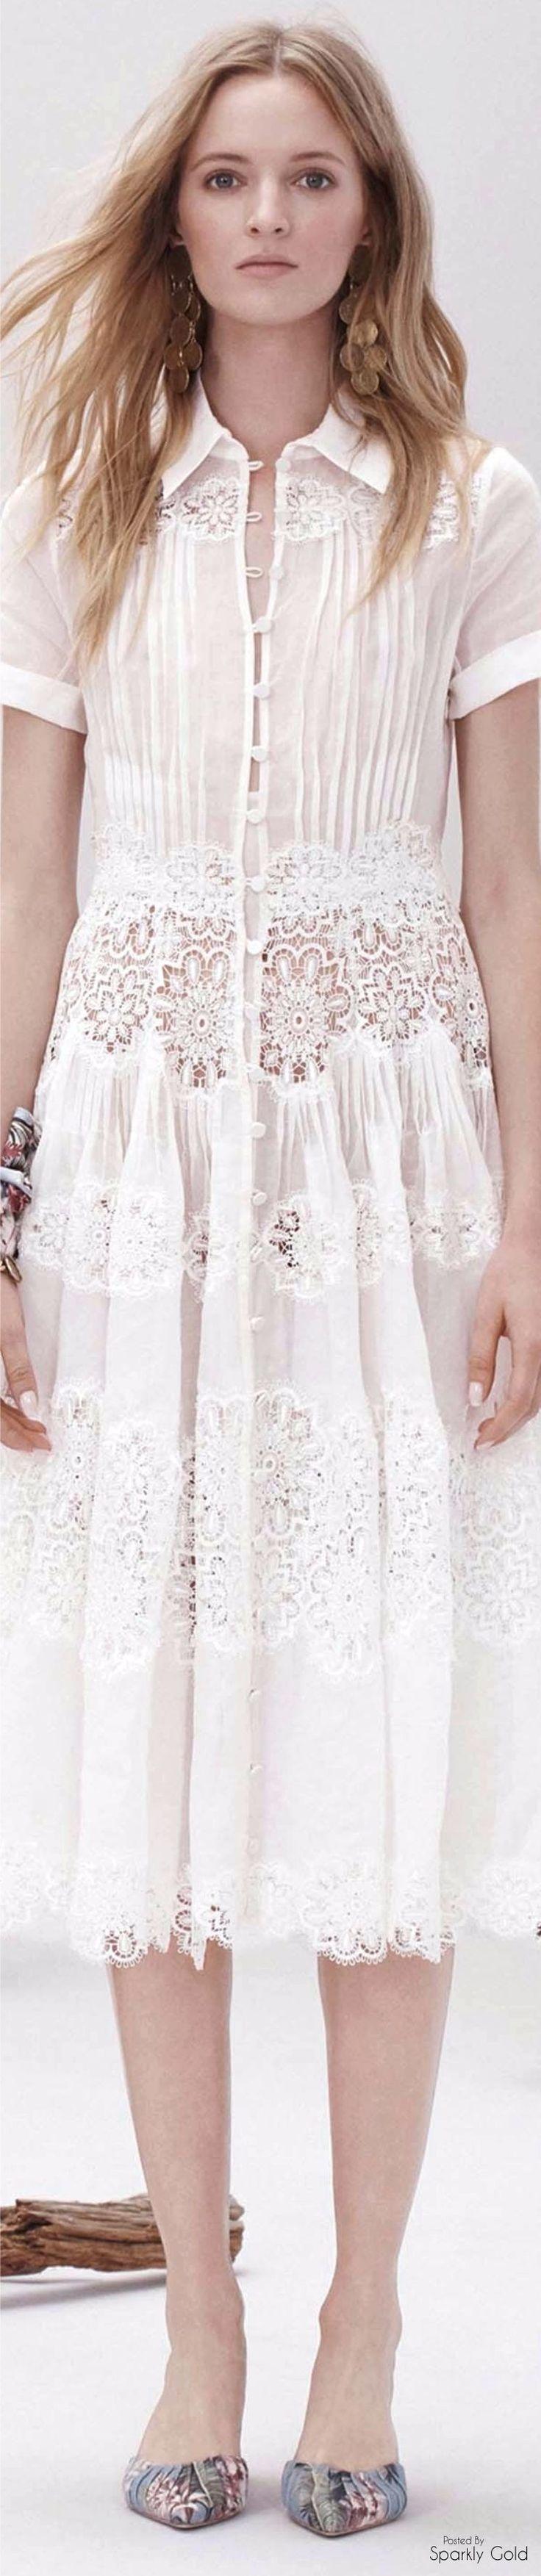 Zimmermann ~ Resort 2017 ..cotton & lace white dress..